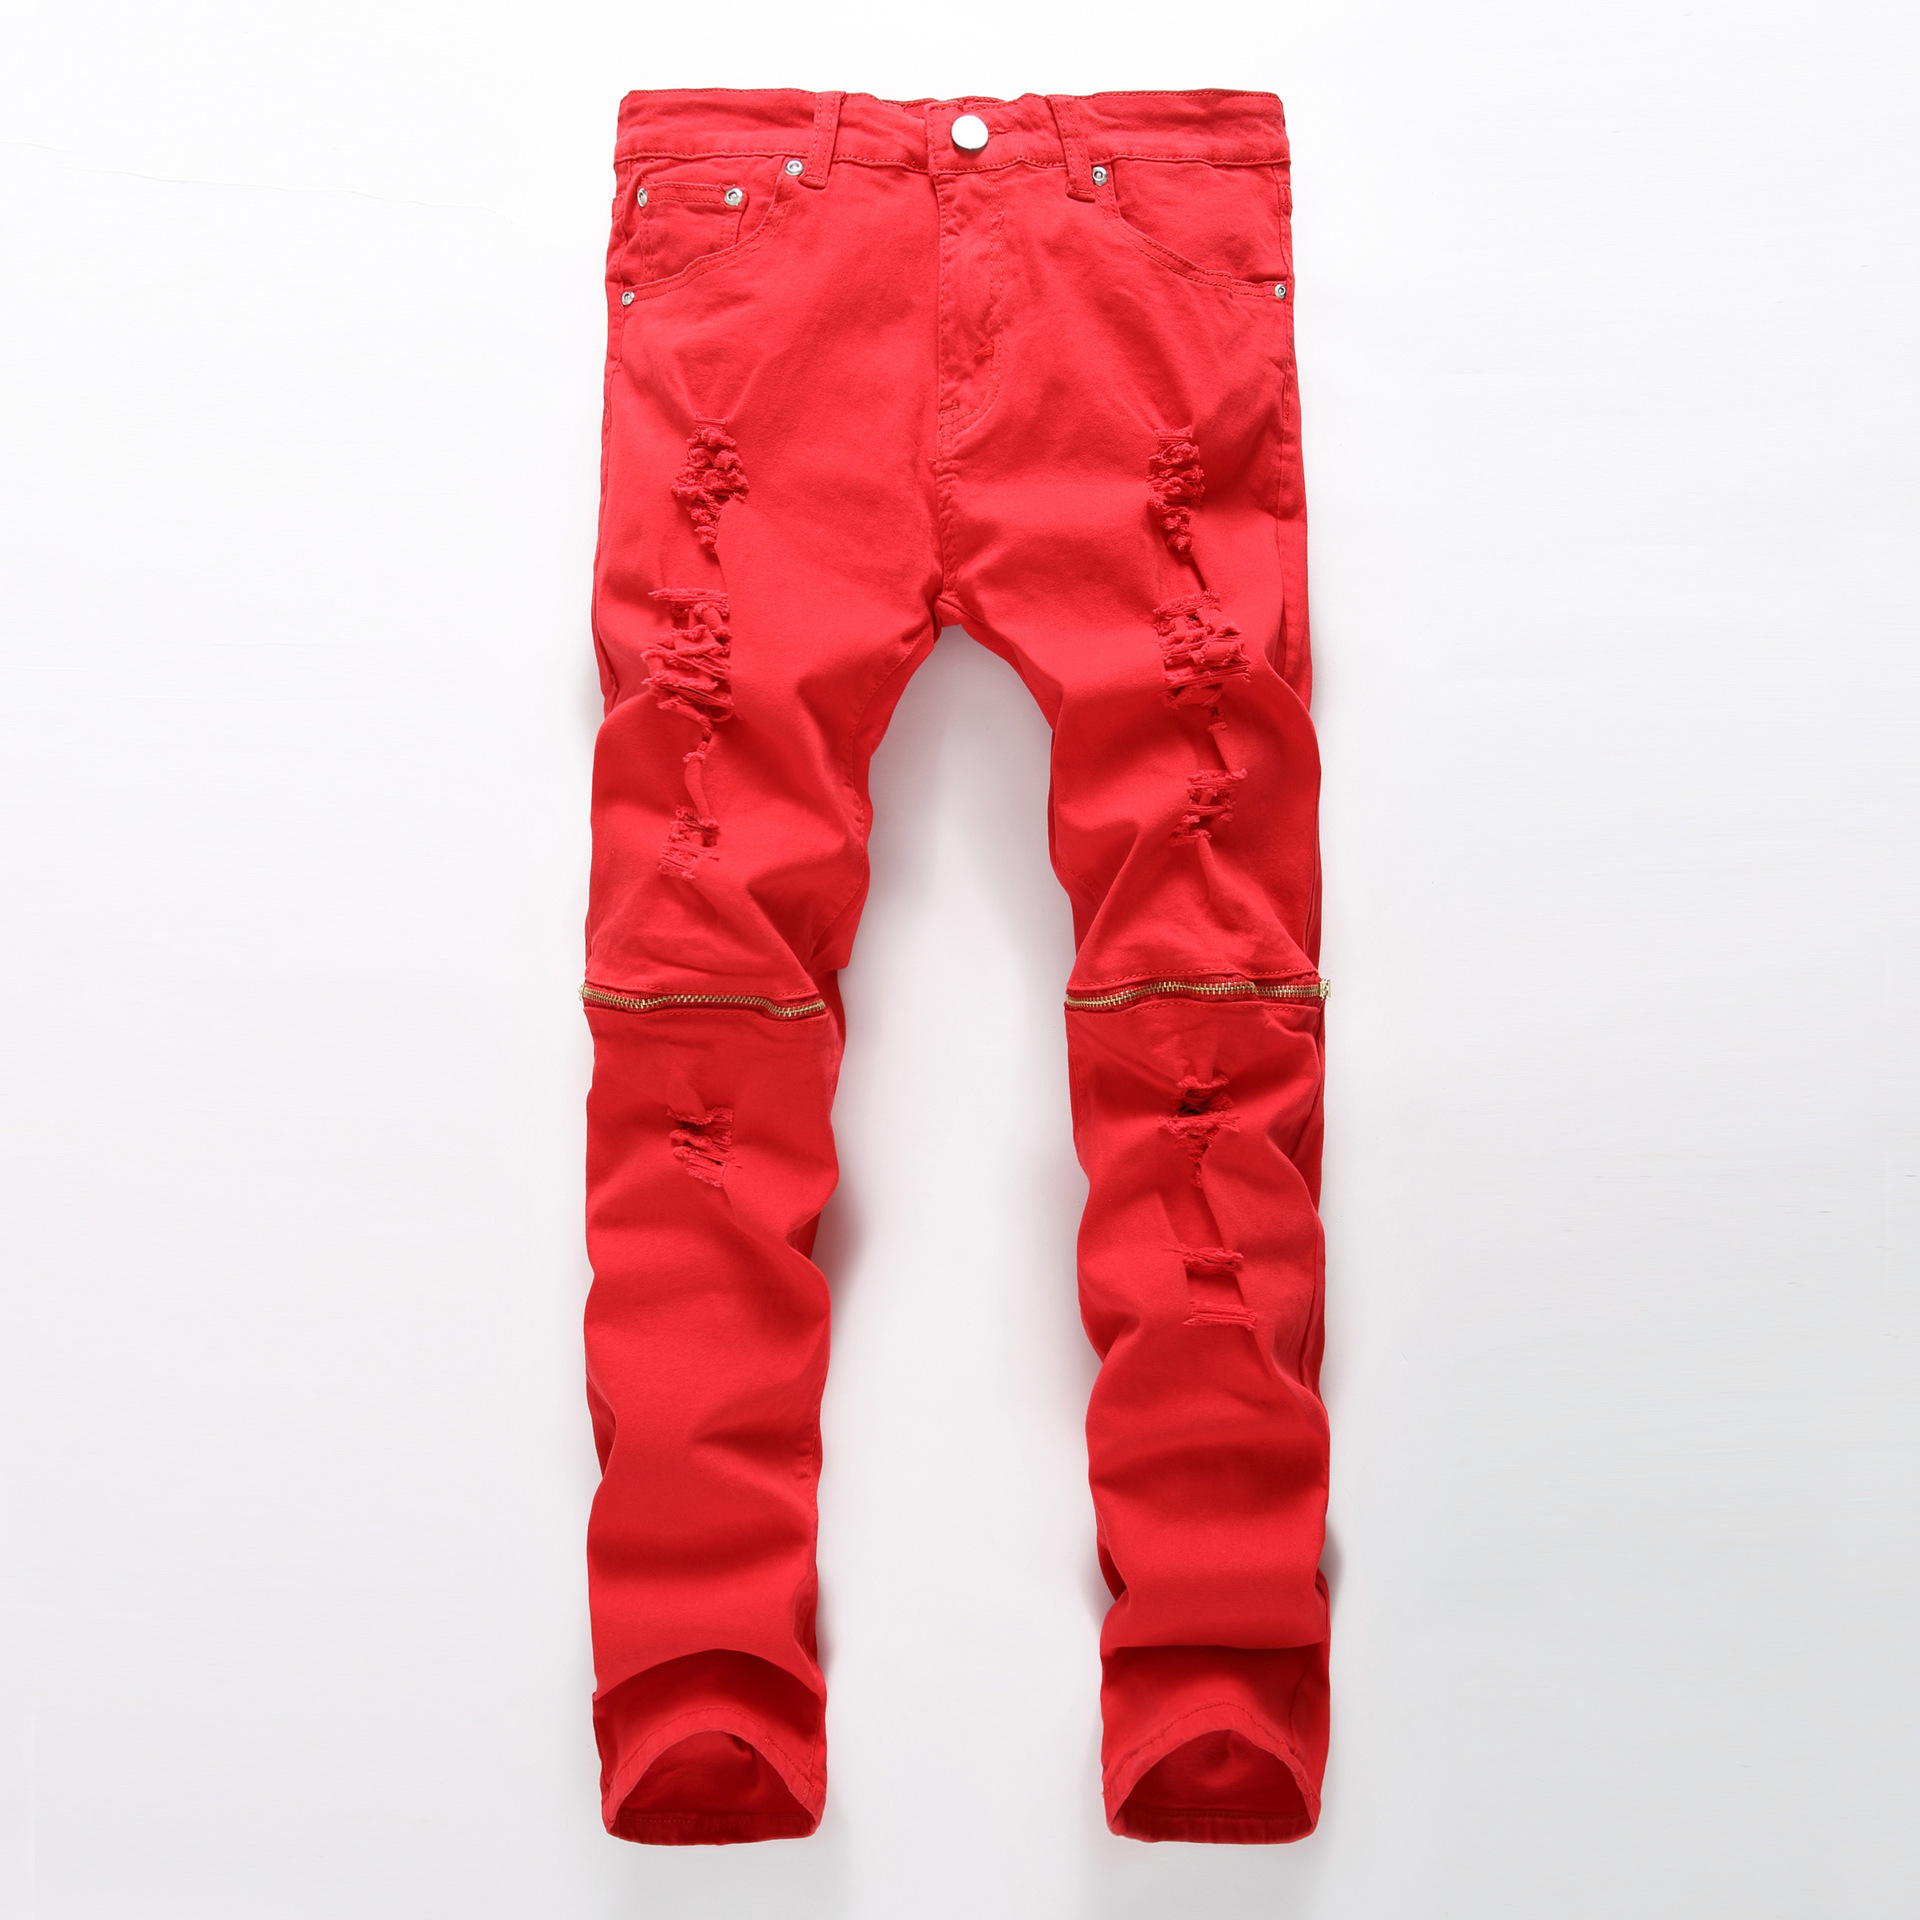 Fashion Ripped jeans Casual Slim fit Biker jeans Hip hop Denim elastic cotton trousers Red zipper decoration Skinny jeans men 2017 fashion patch jeans men slim straight denim jeans ripped trousers new famous brand biker jeans logo mens zipper jeans 604